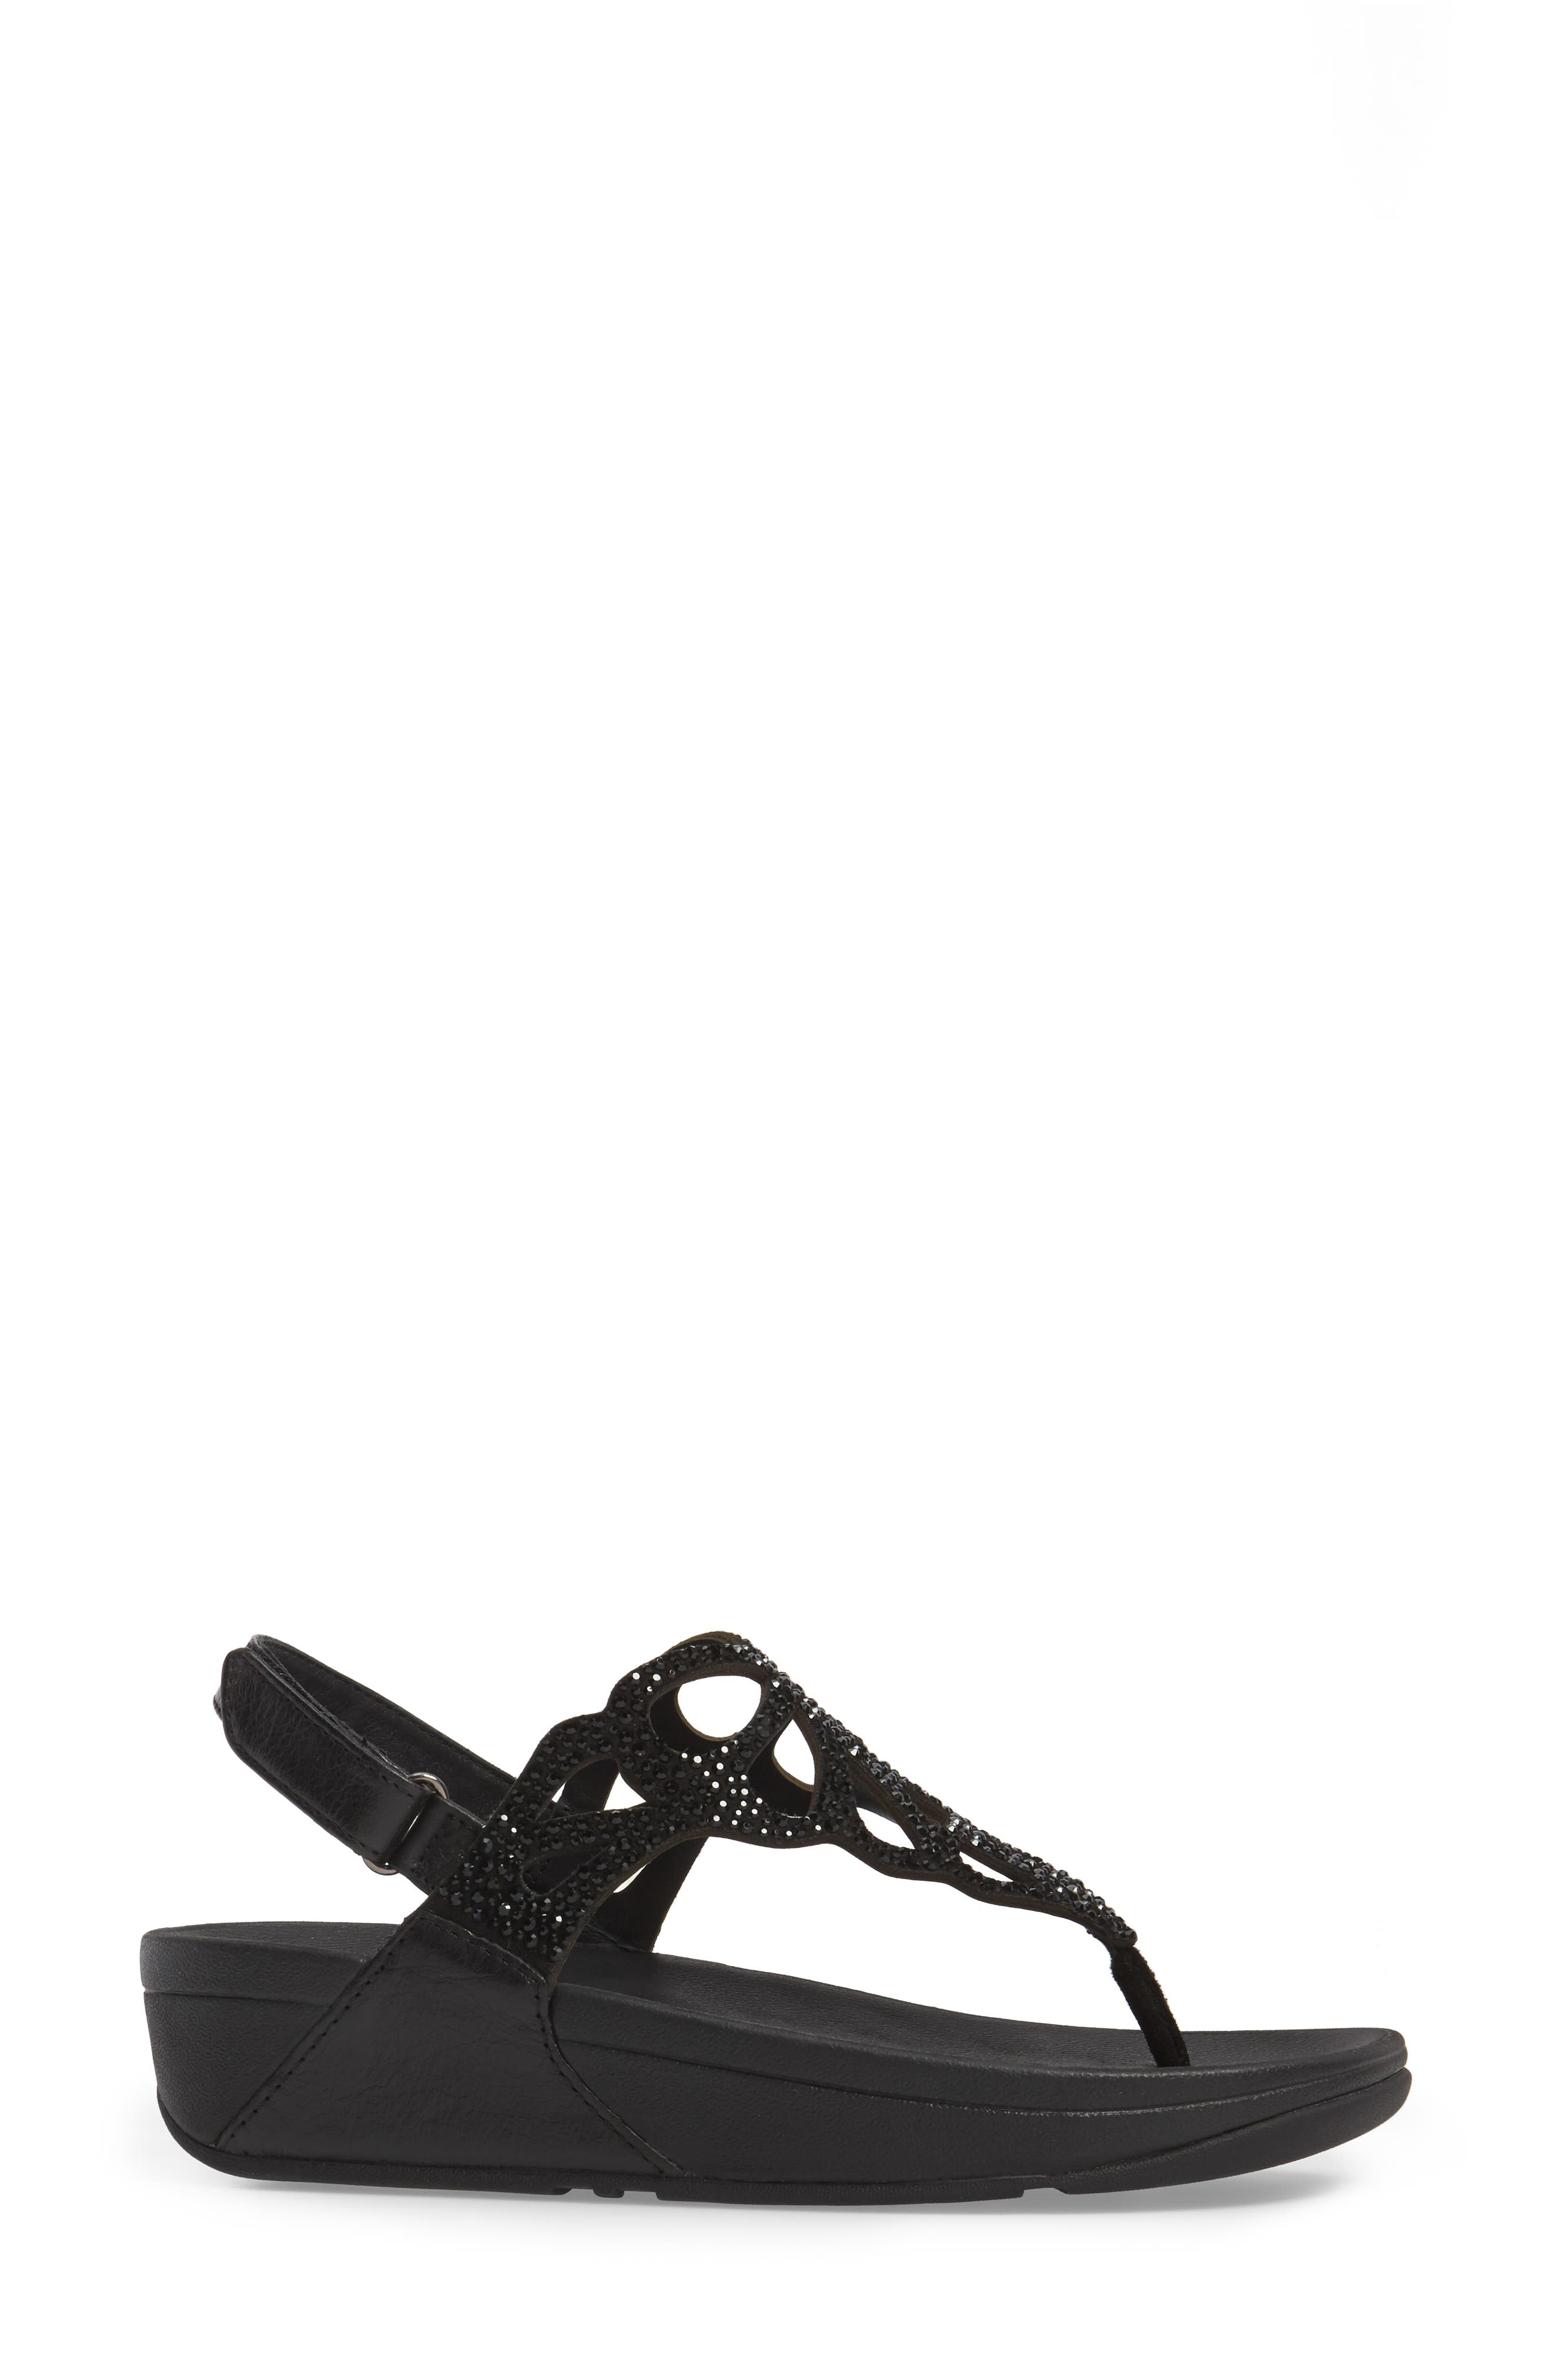 Bumble Crystal Embellished Sandal,                             Alternate thumbnail 3, color,                             Black Leather